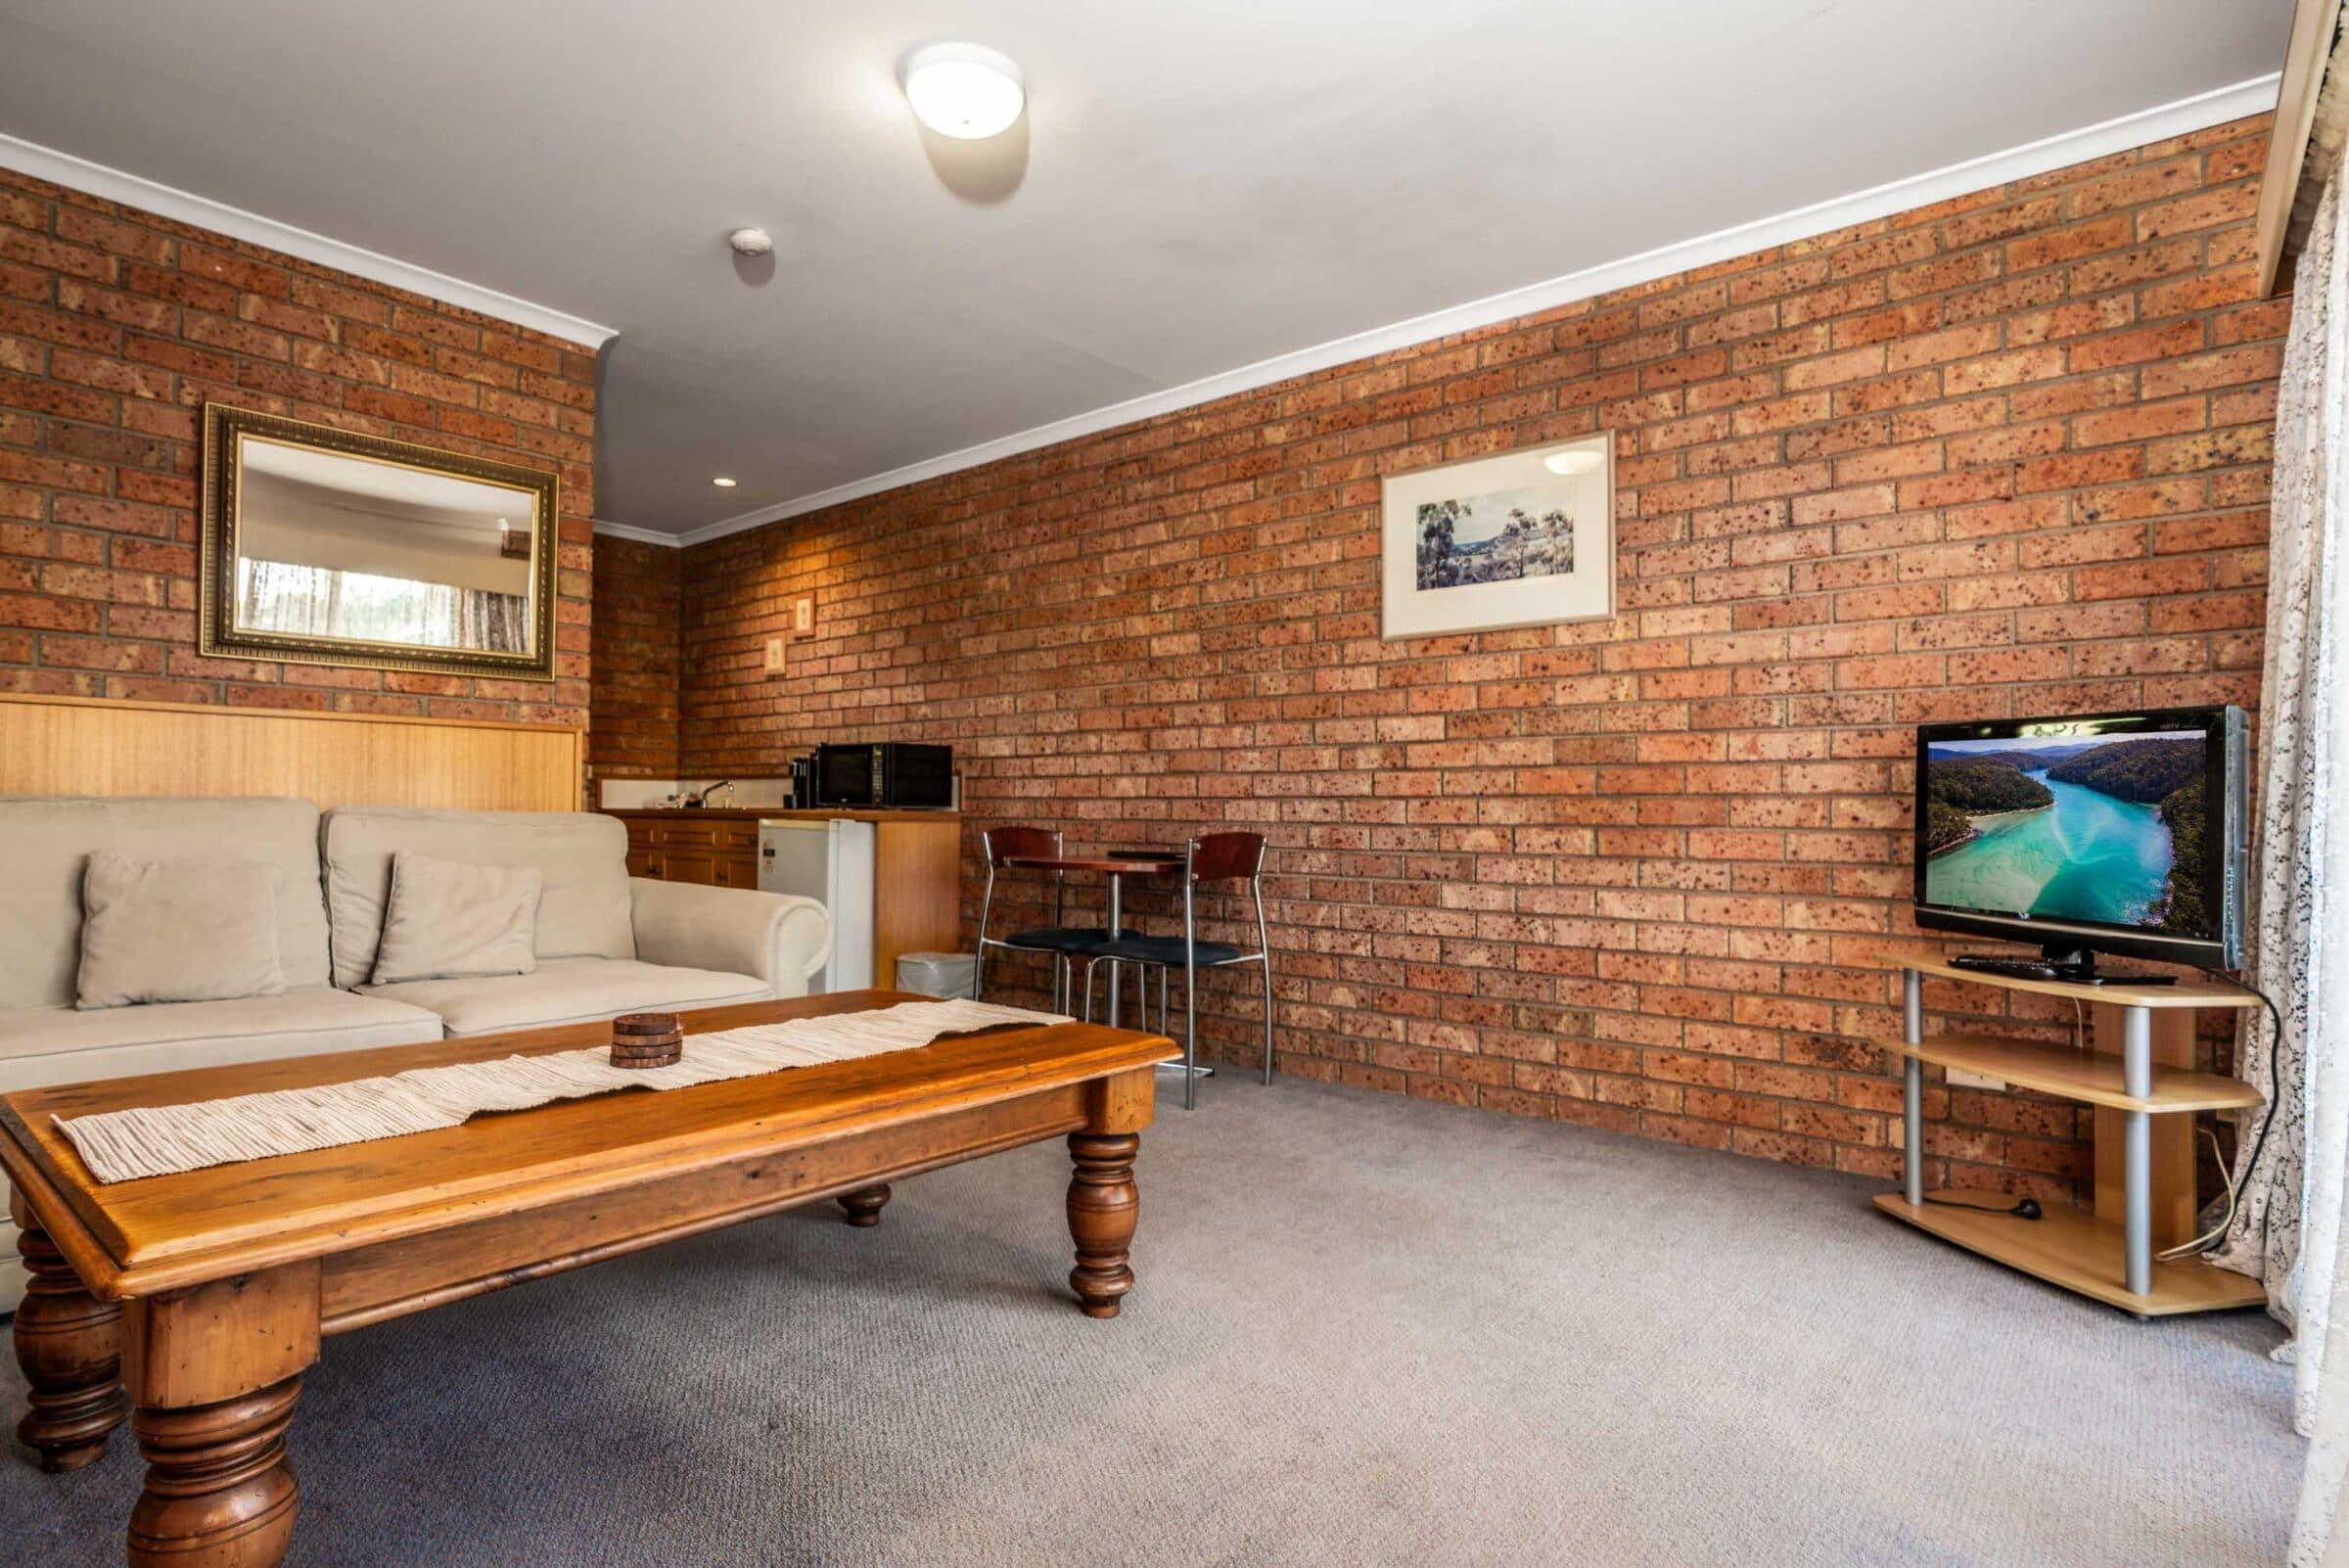 14-Lounge Suite-14 Small Suite Merimbula Motel Accommodation - Comfort Inn Merimbula